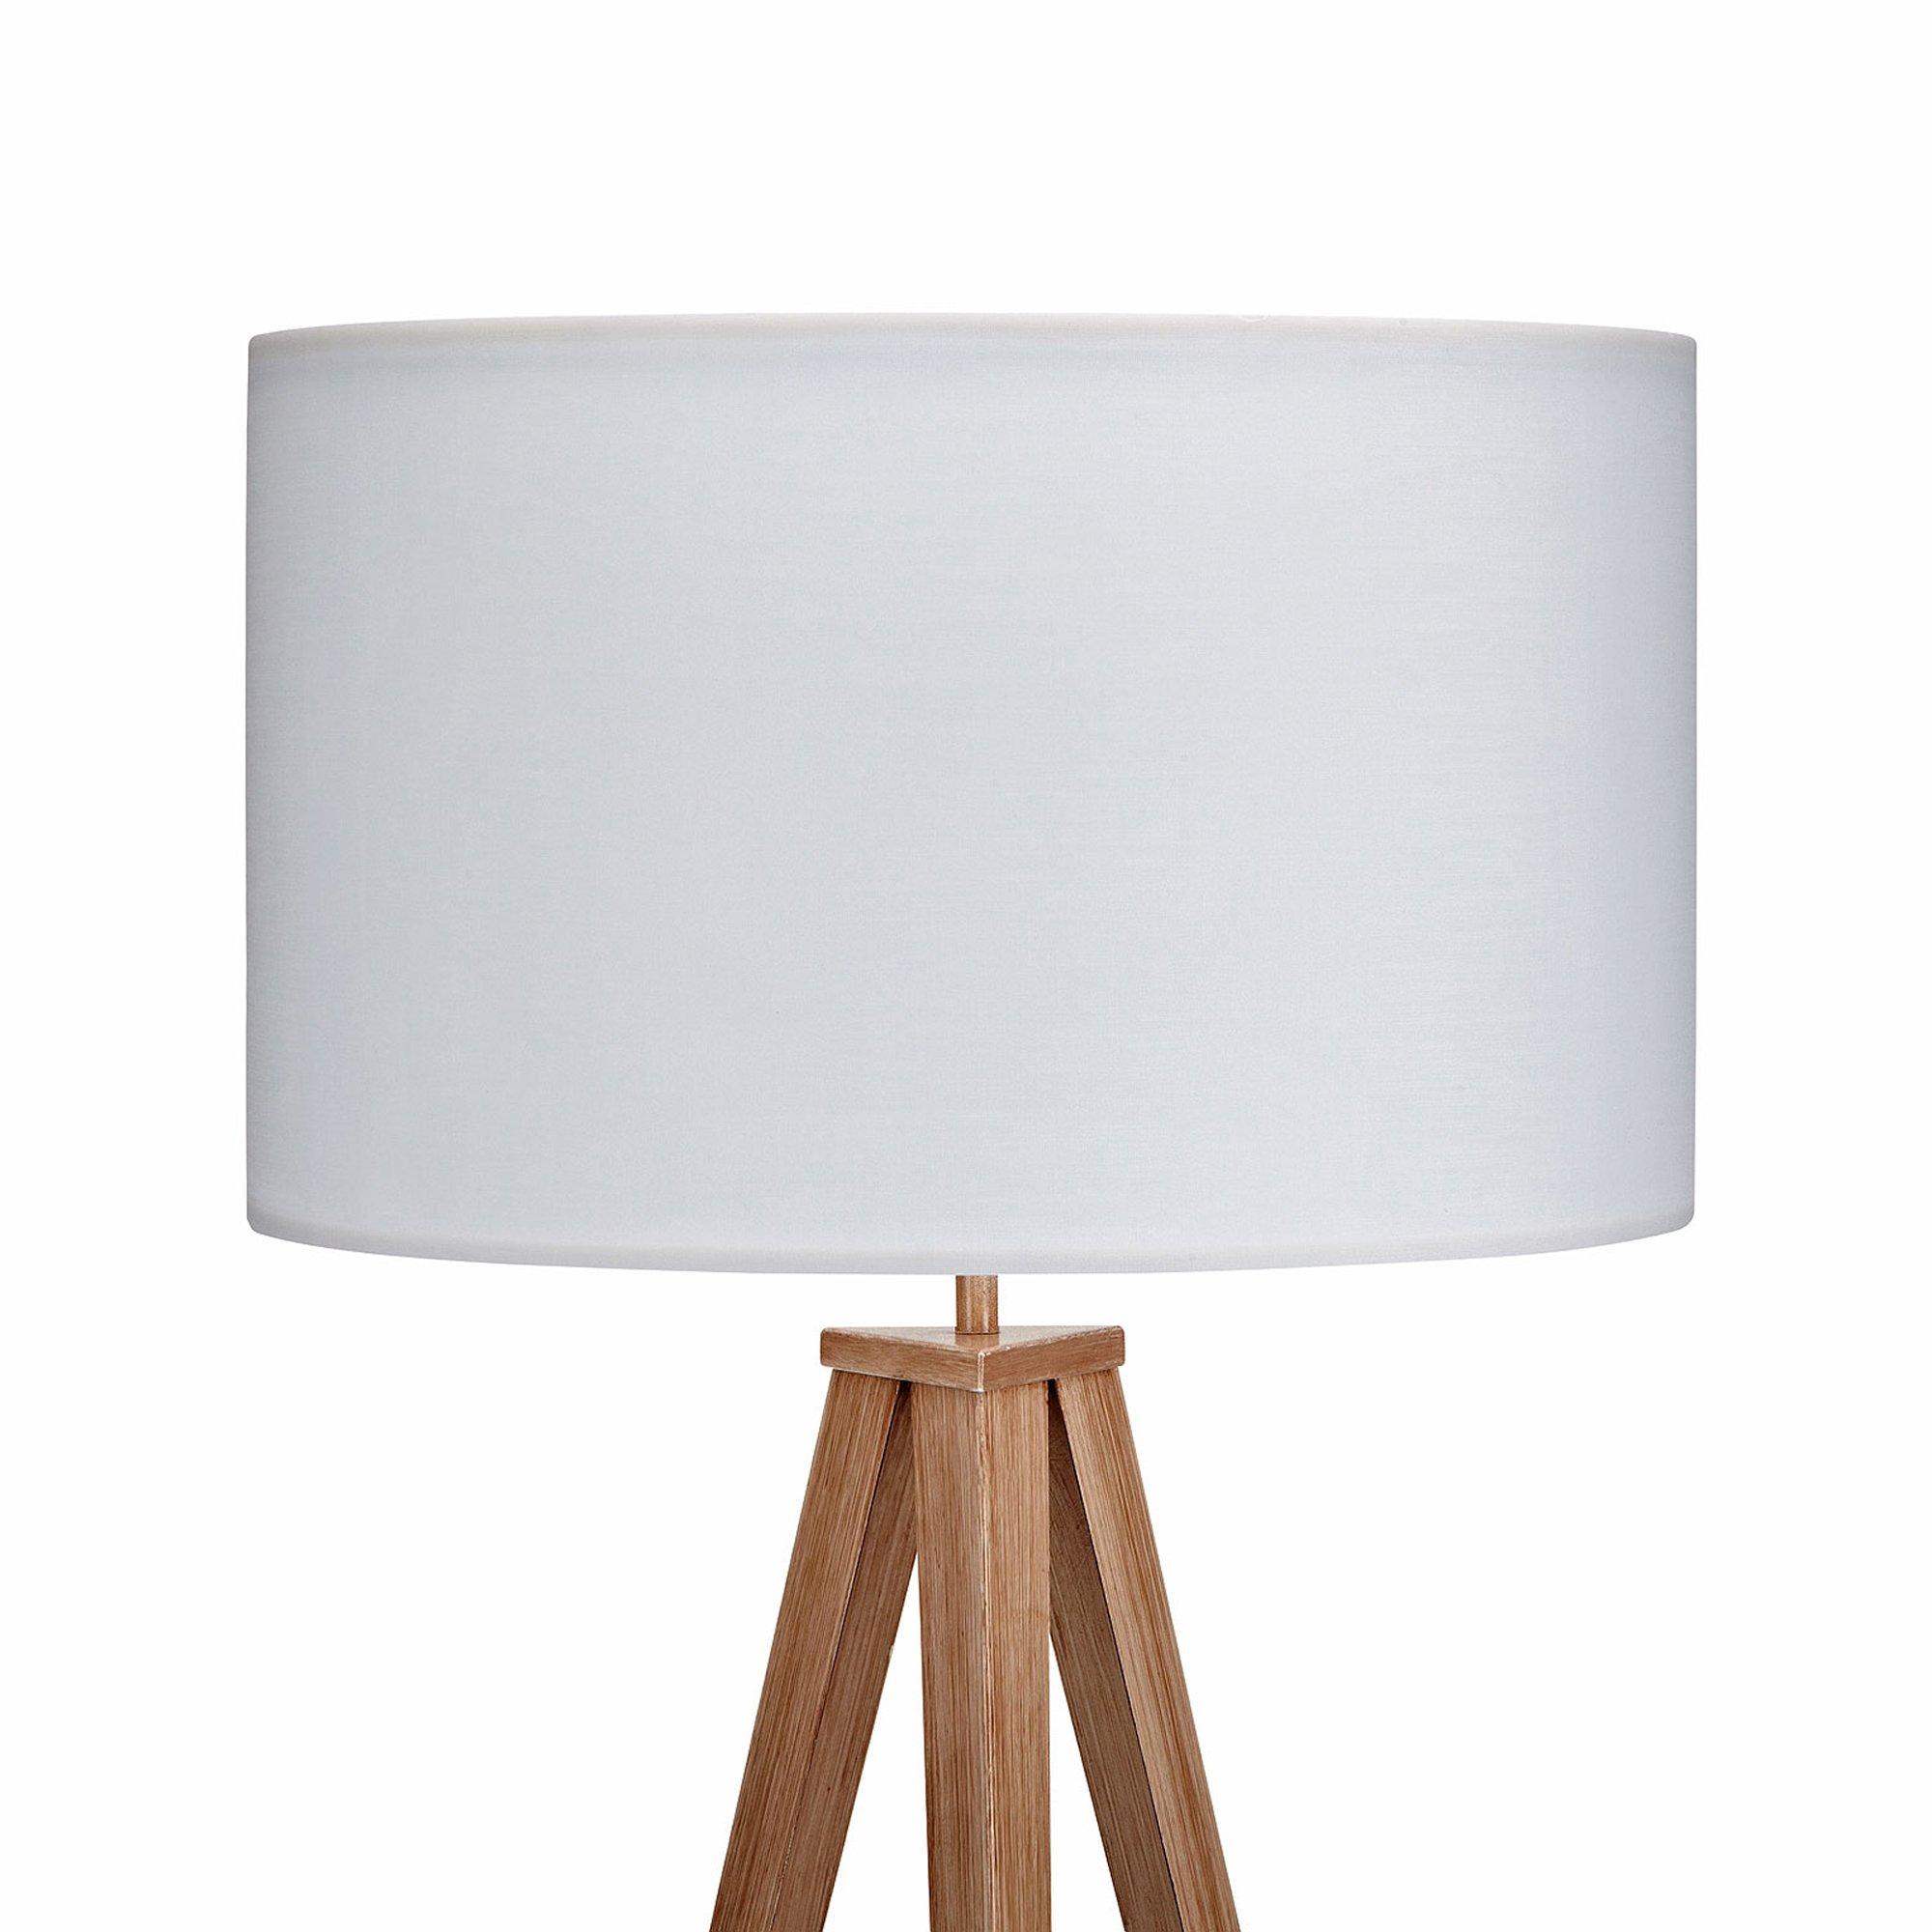 Versanora VN-L00007 Romanza Tripod Floor Lamp, White/Faux wooden leg by Versanora (Image #4)